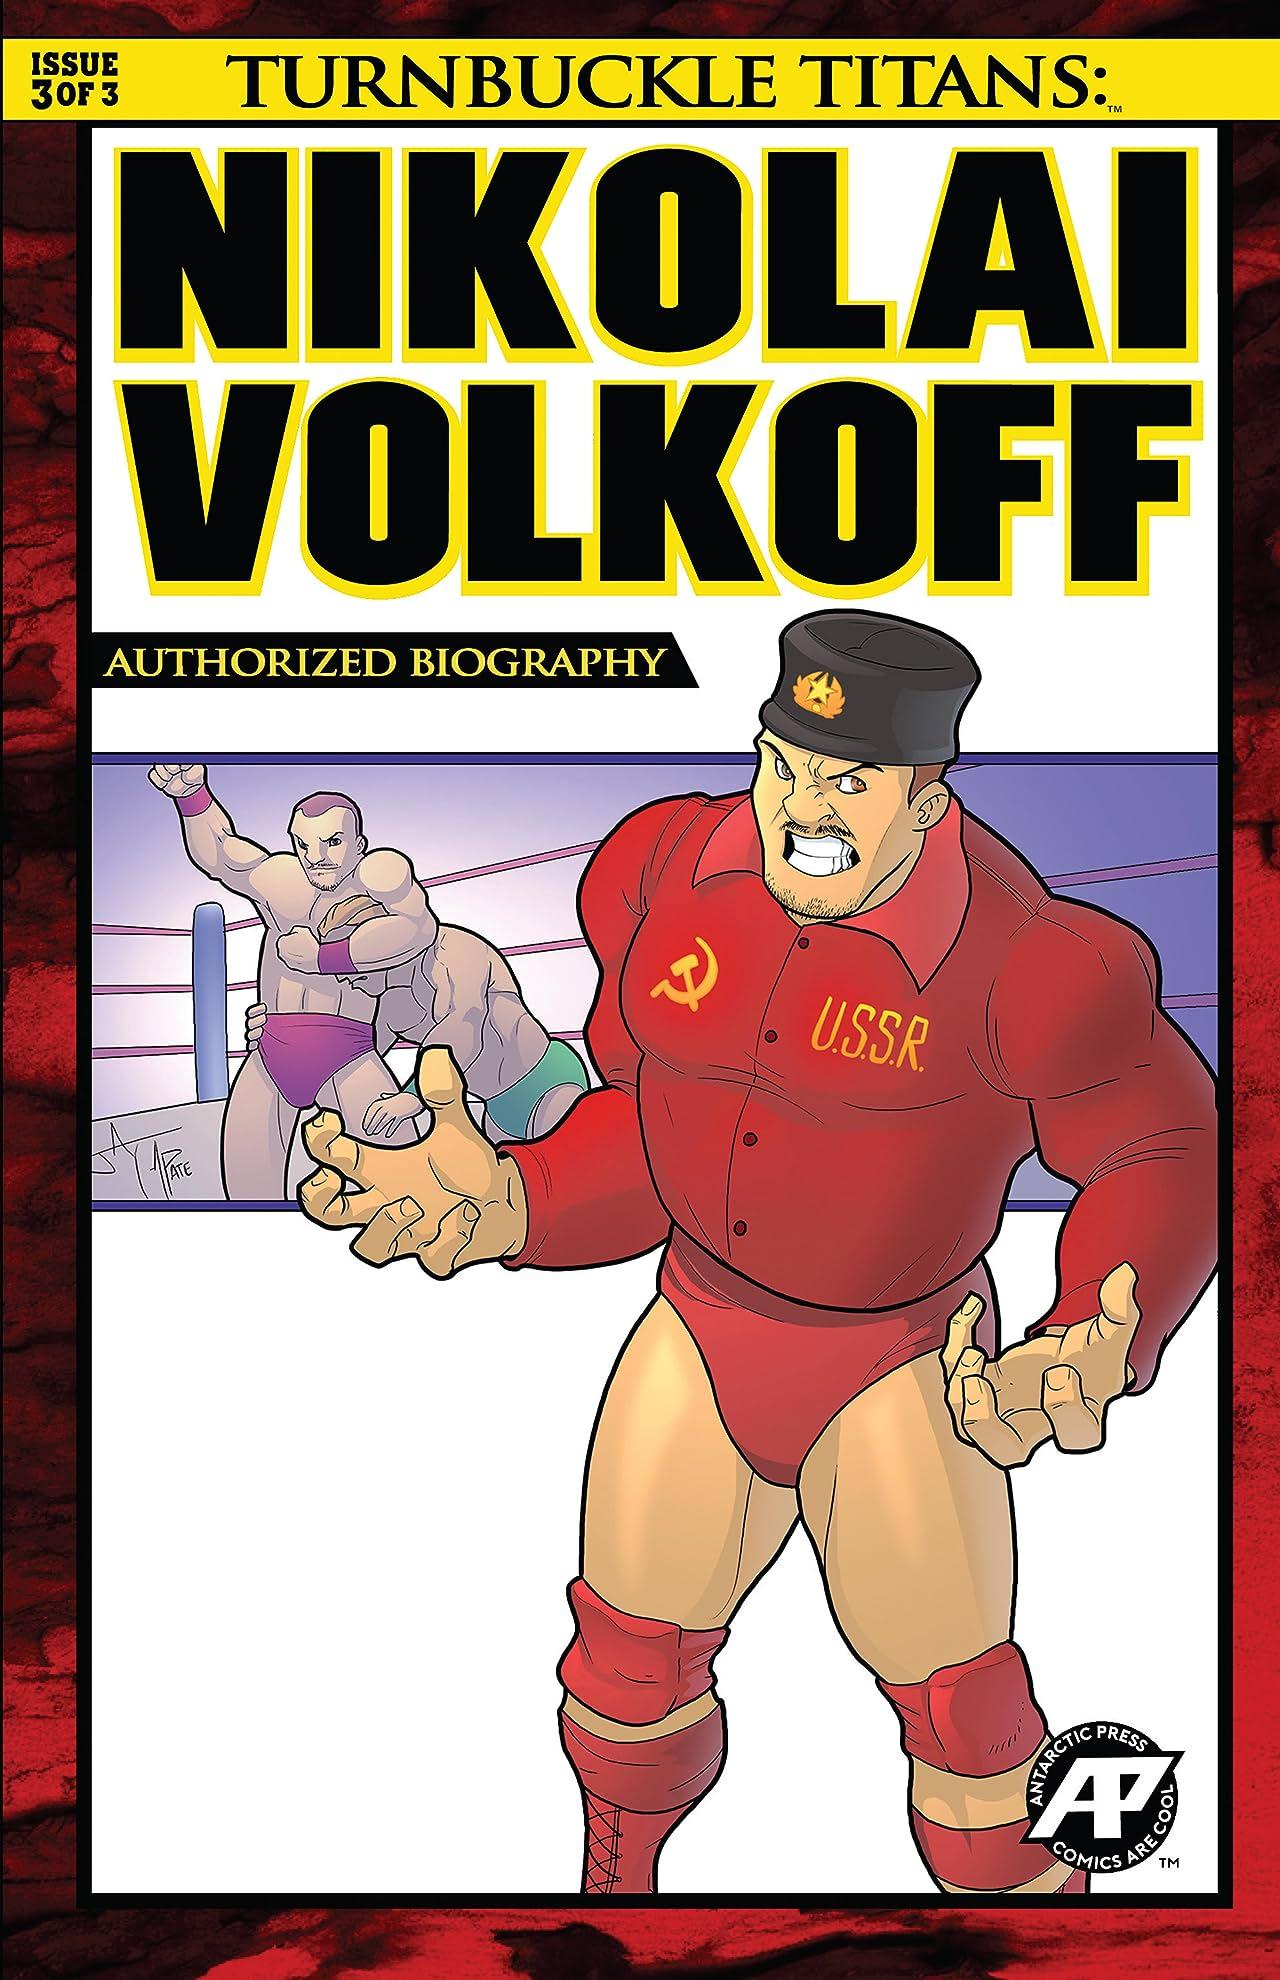 Turnbuckle Titans: Nikolai Volkoff #3